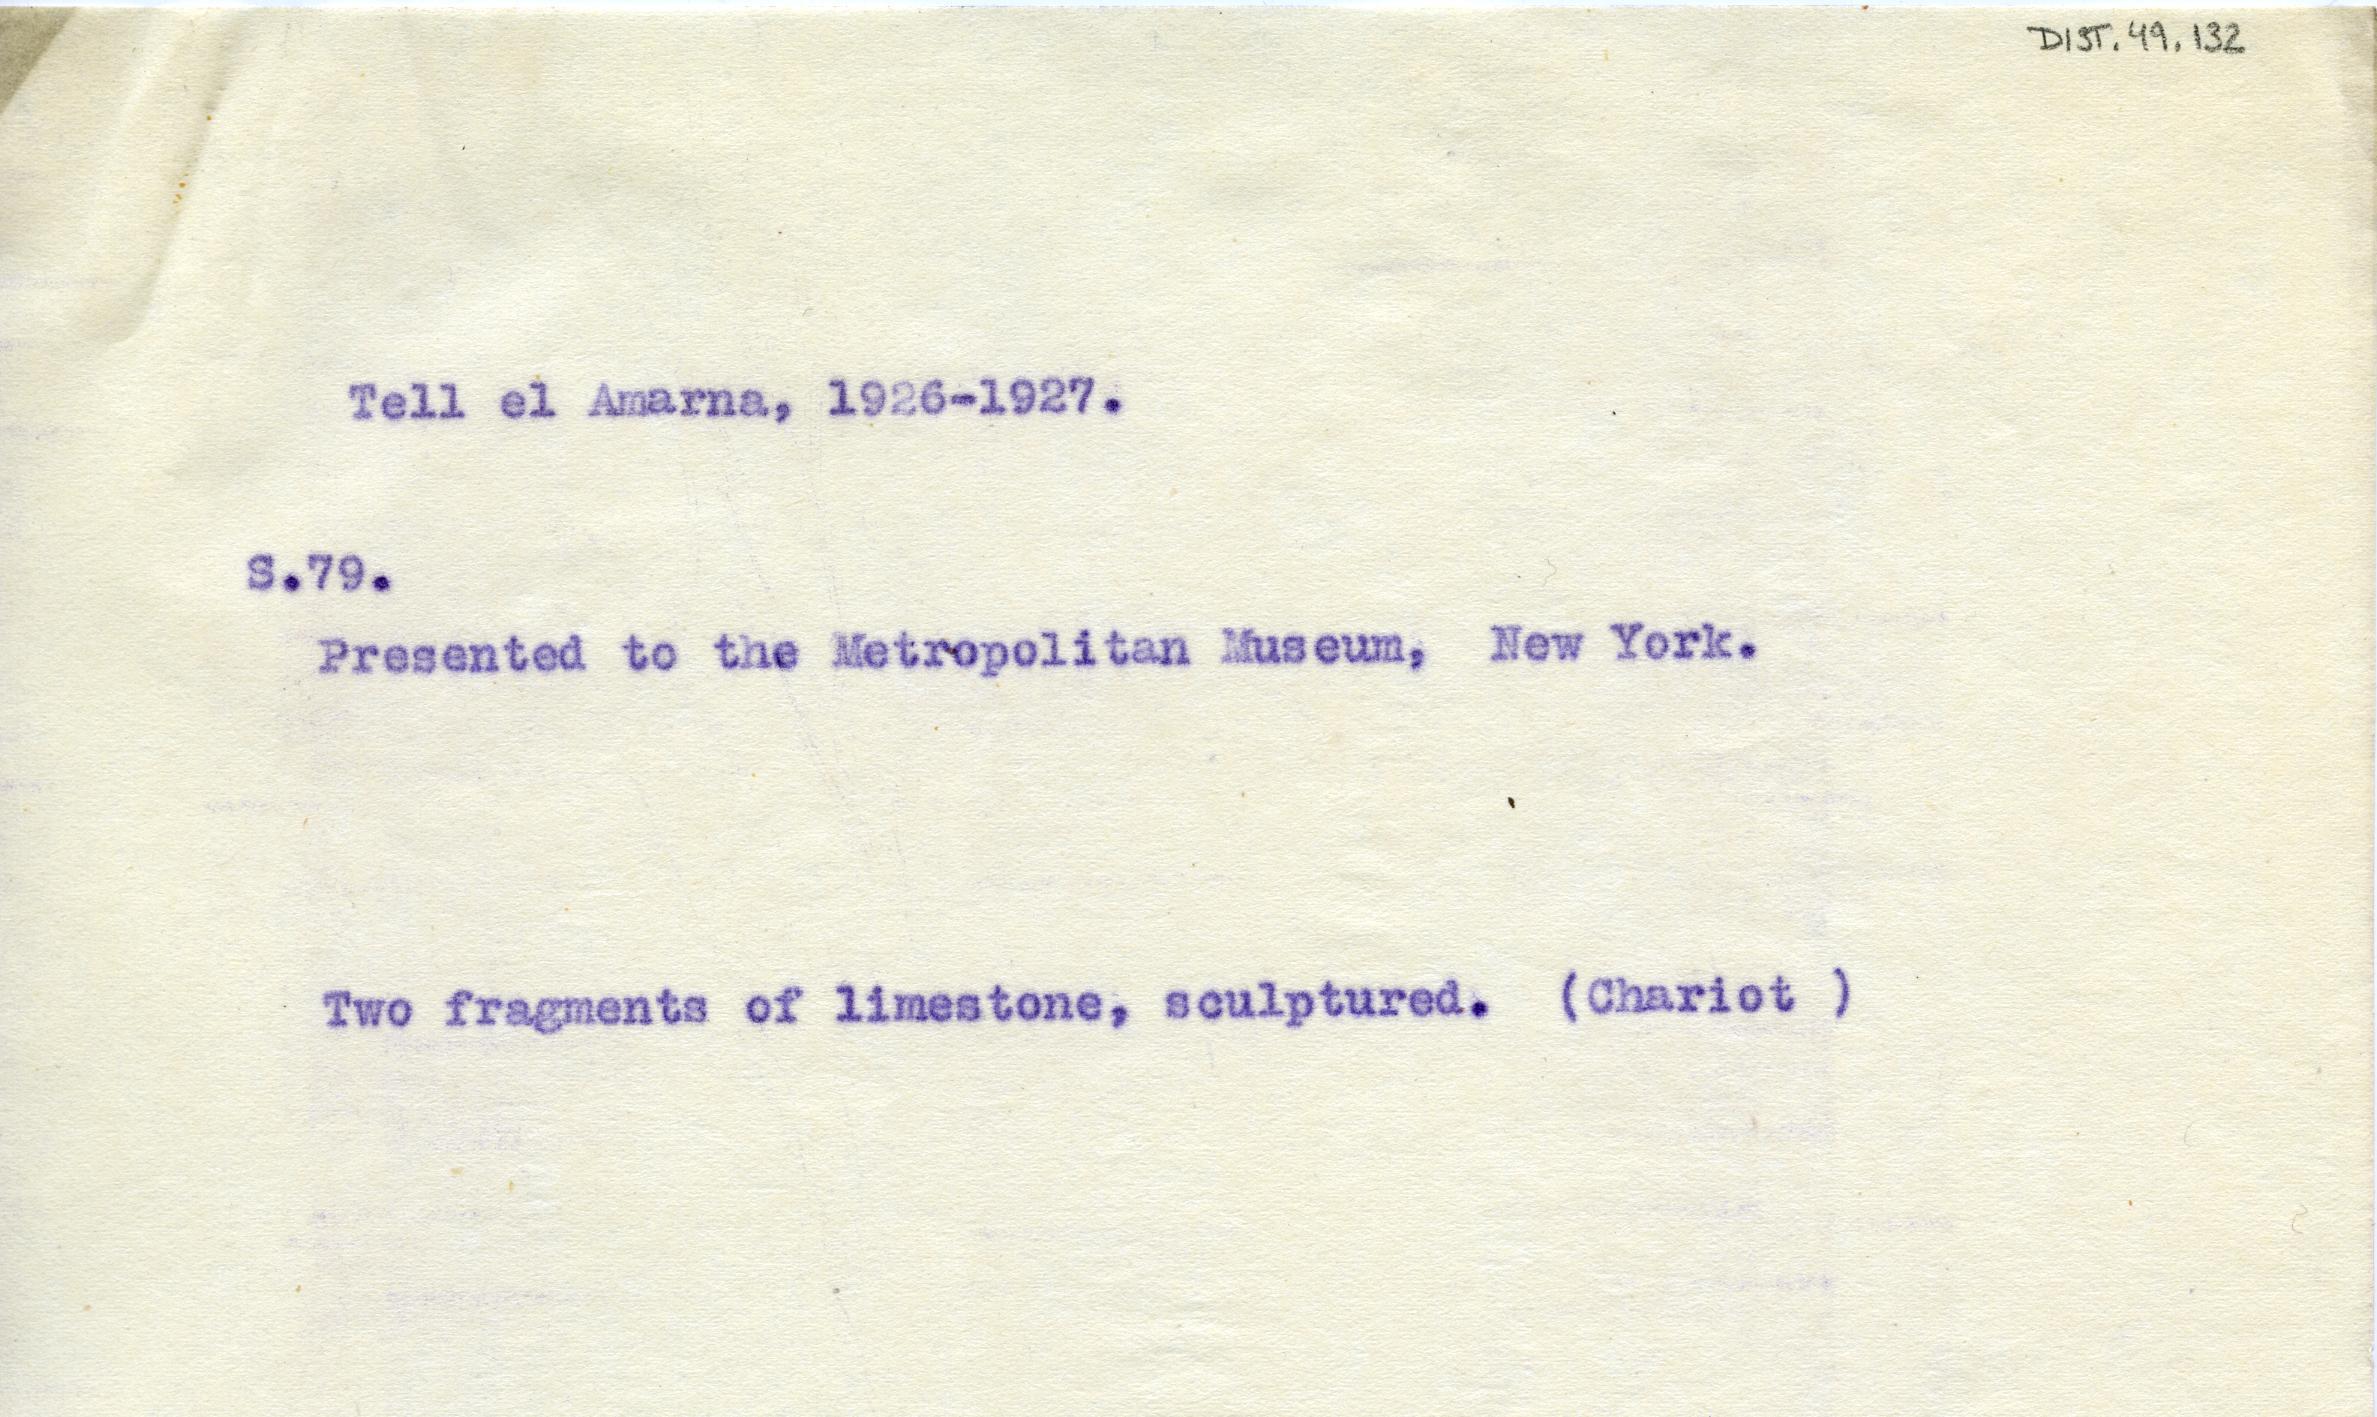 1926-27 el-Amarna DIST.49.132